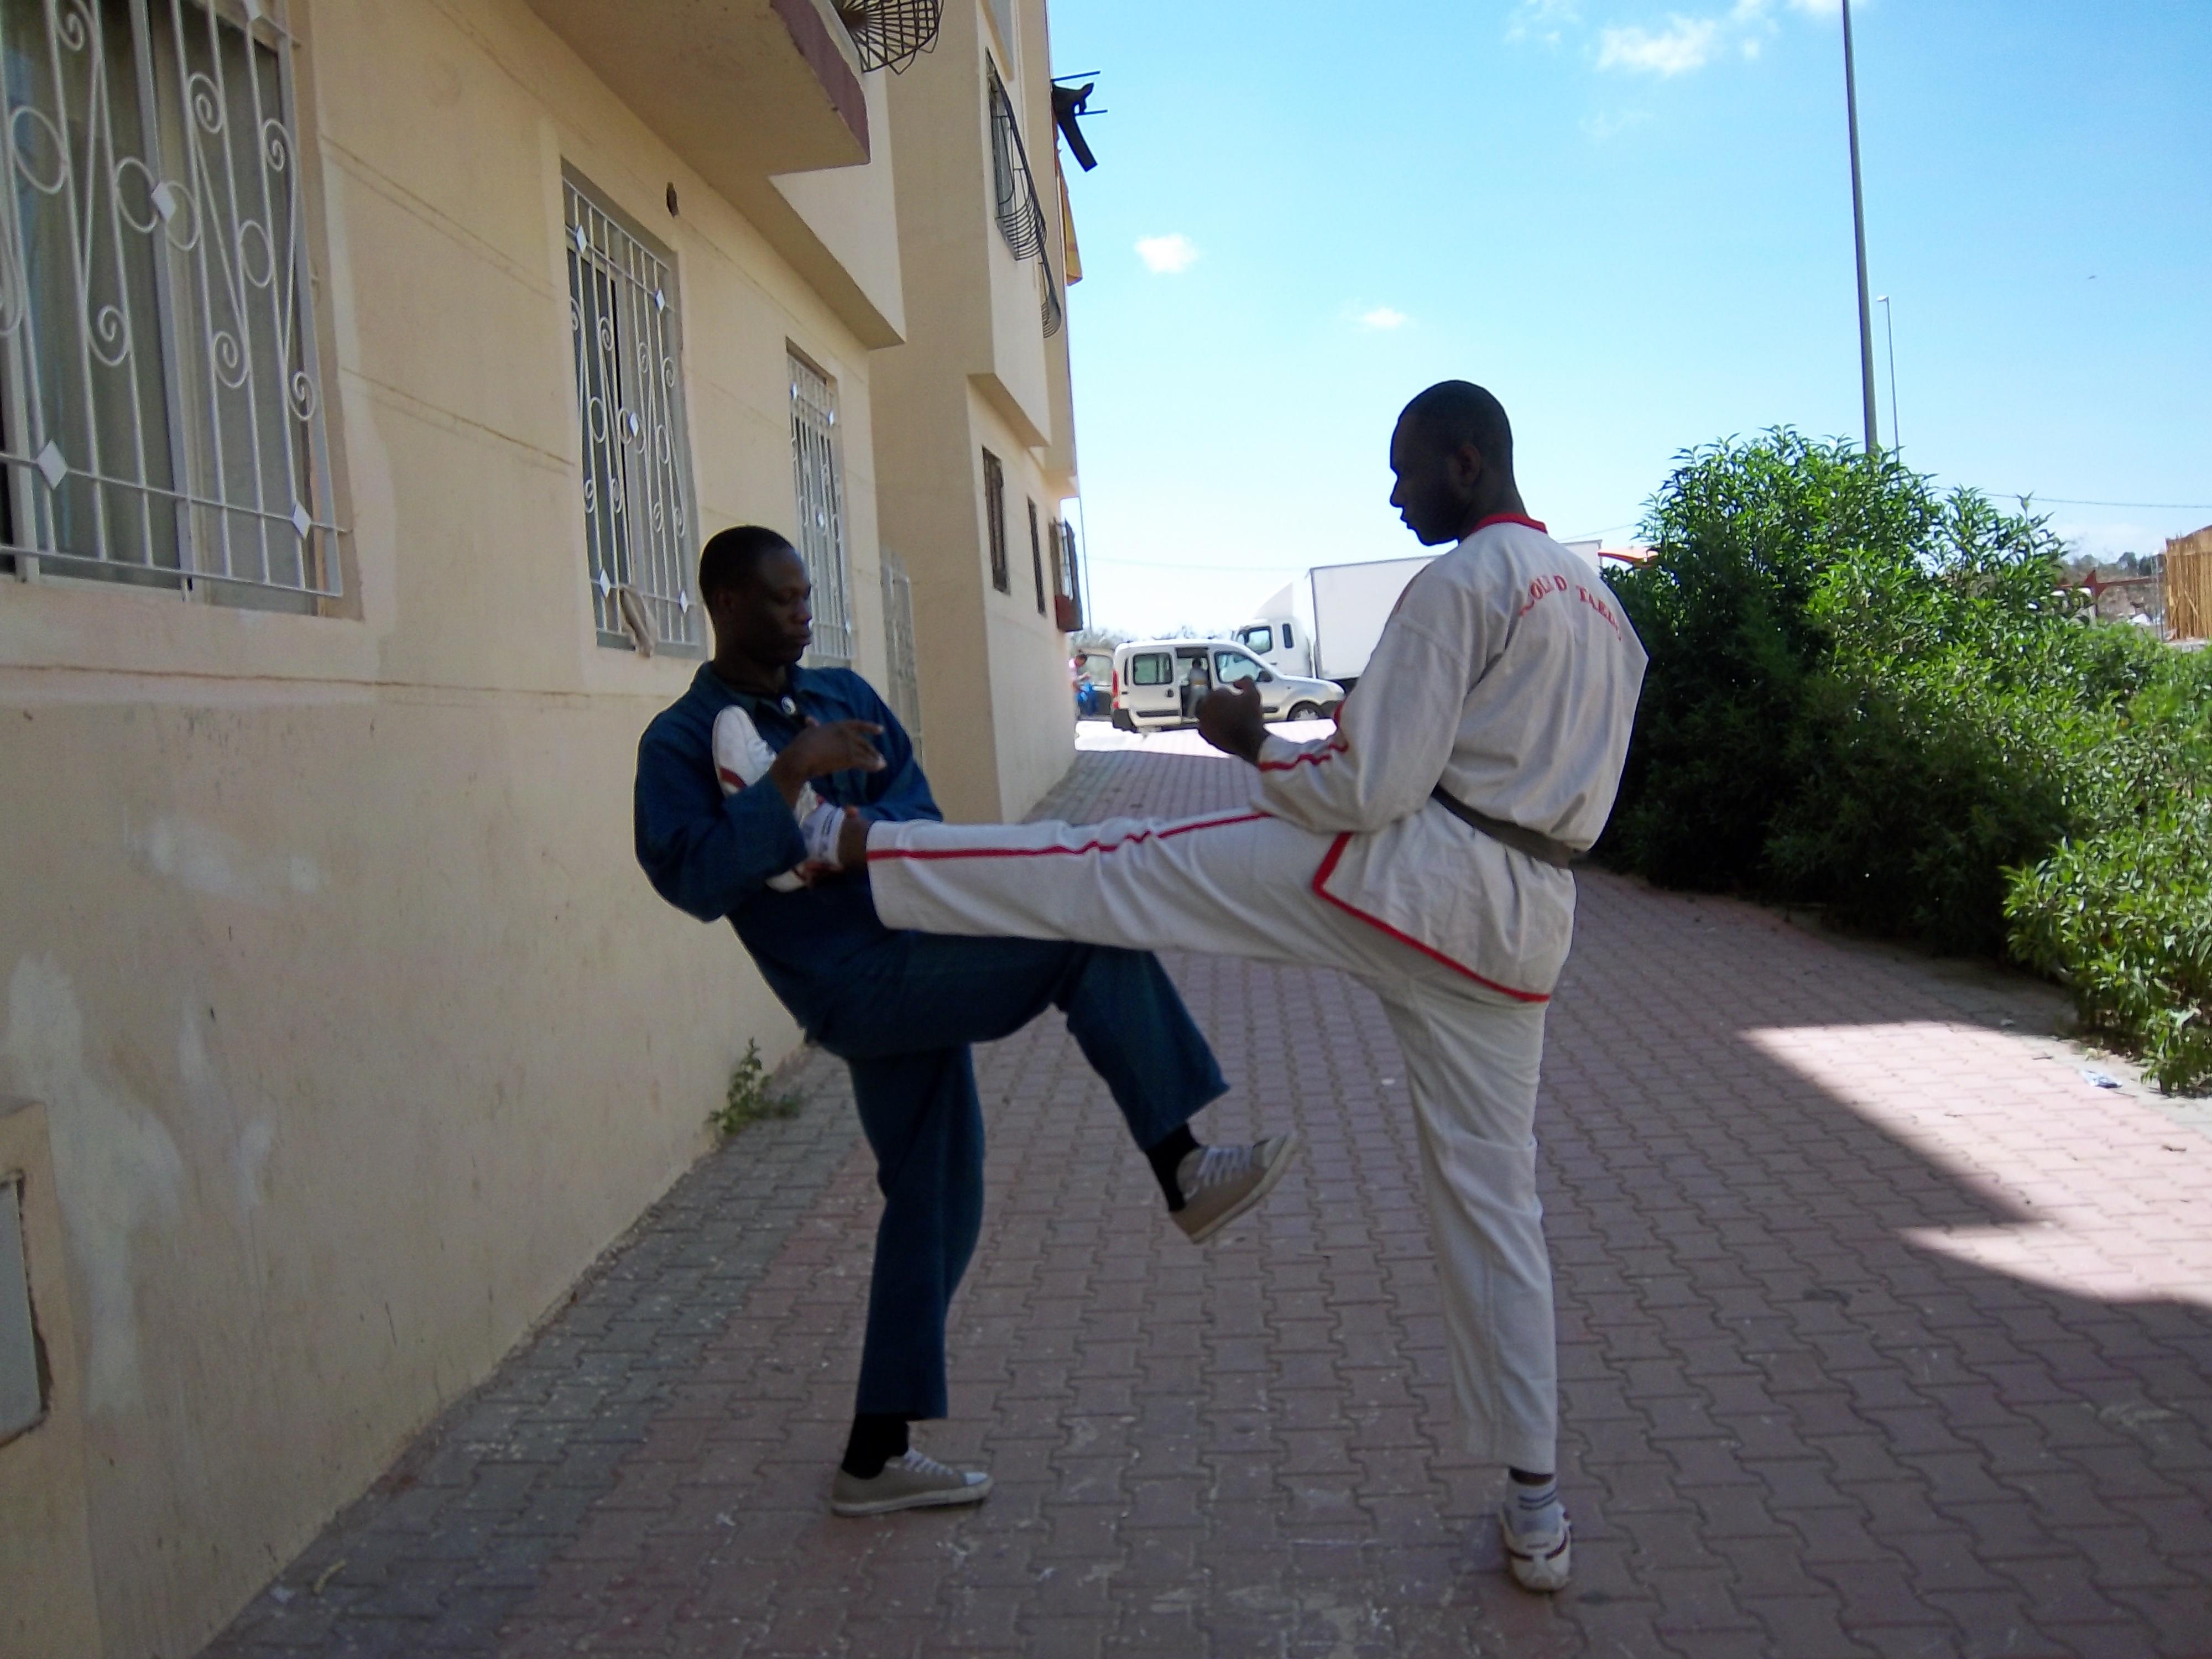 uniforme kung fu traditionnel